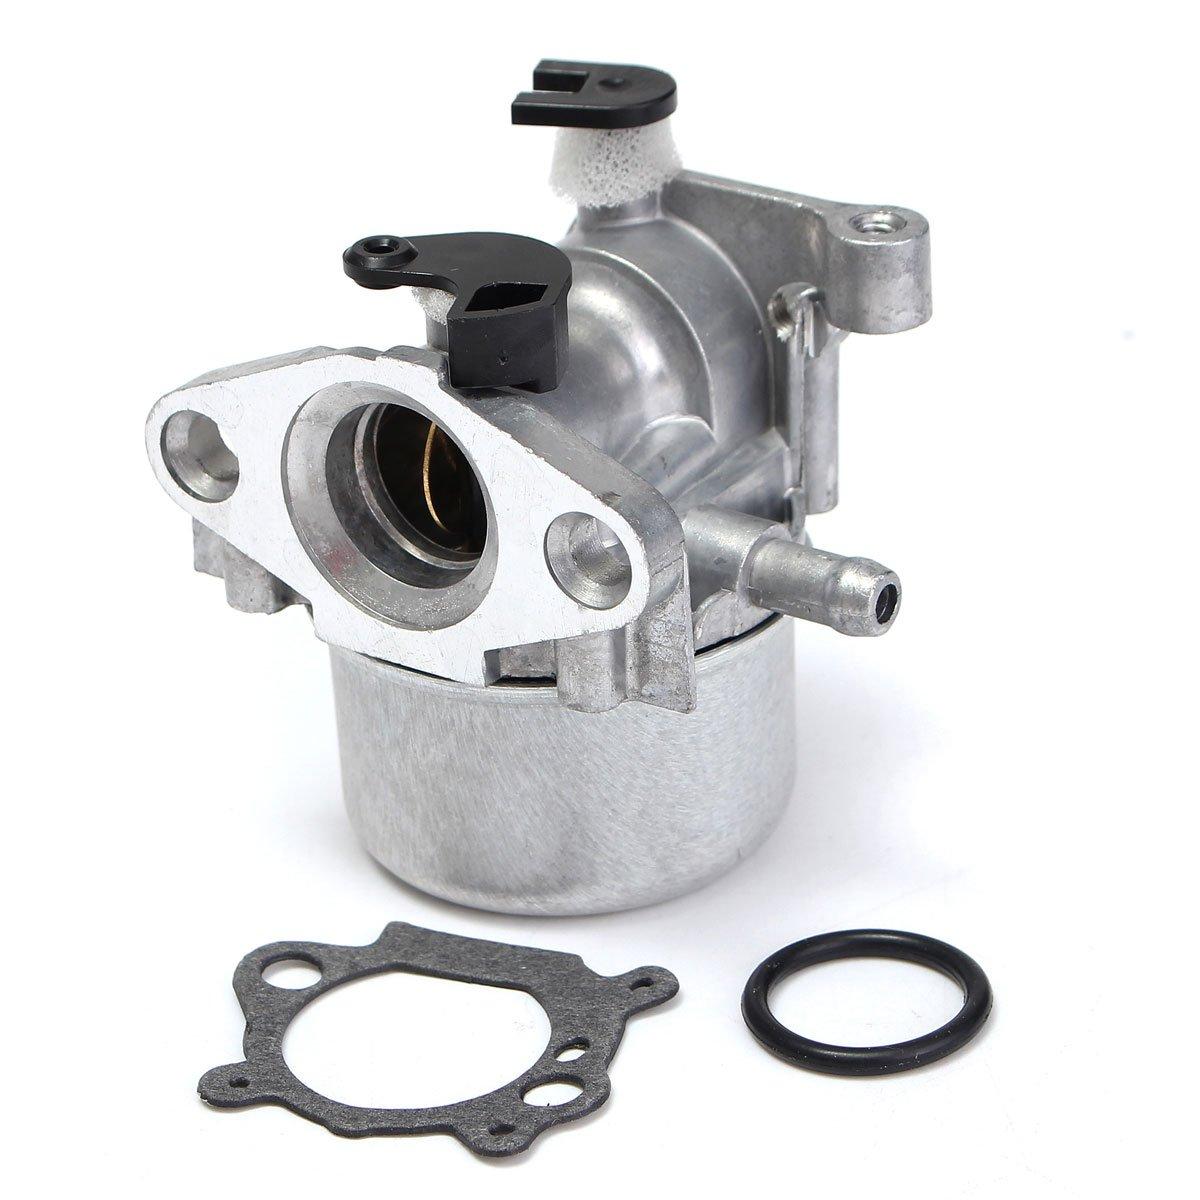 Alamor Carburateur avec Joint pour Briggs Stratton 794304 796707 799866 790845 799871 Craftsman